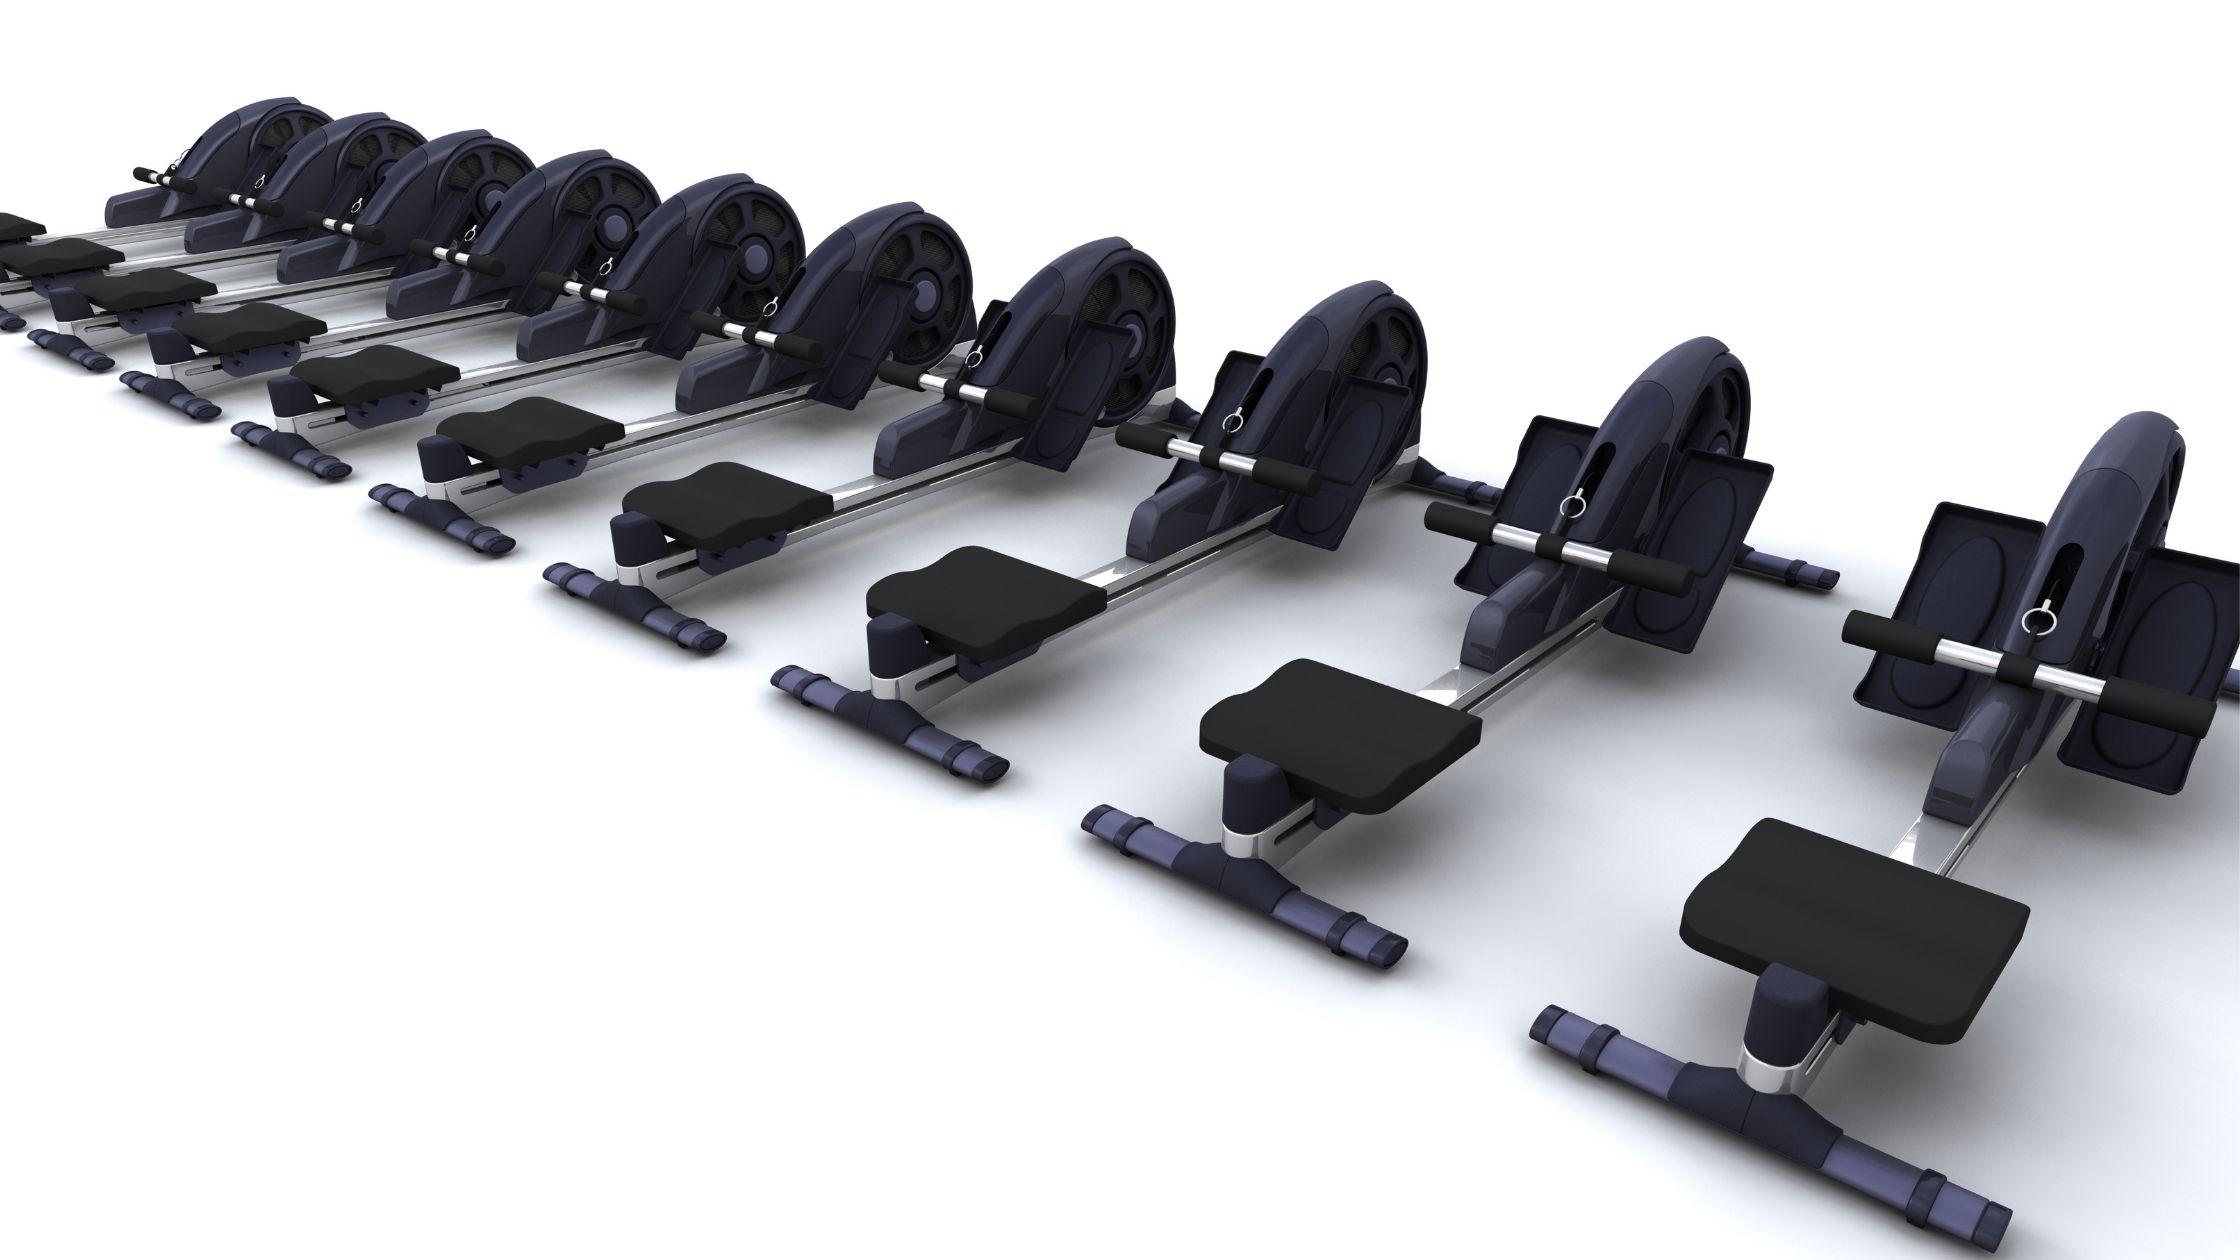 Types of Rowing Machines: Recumbent Rower